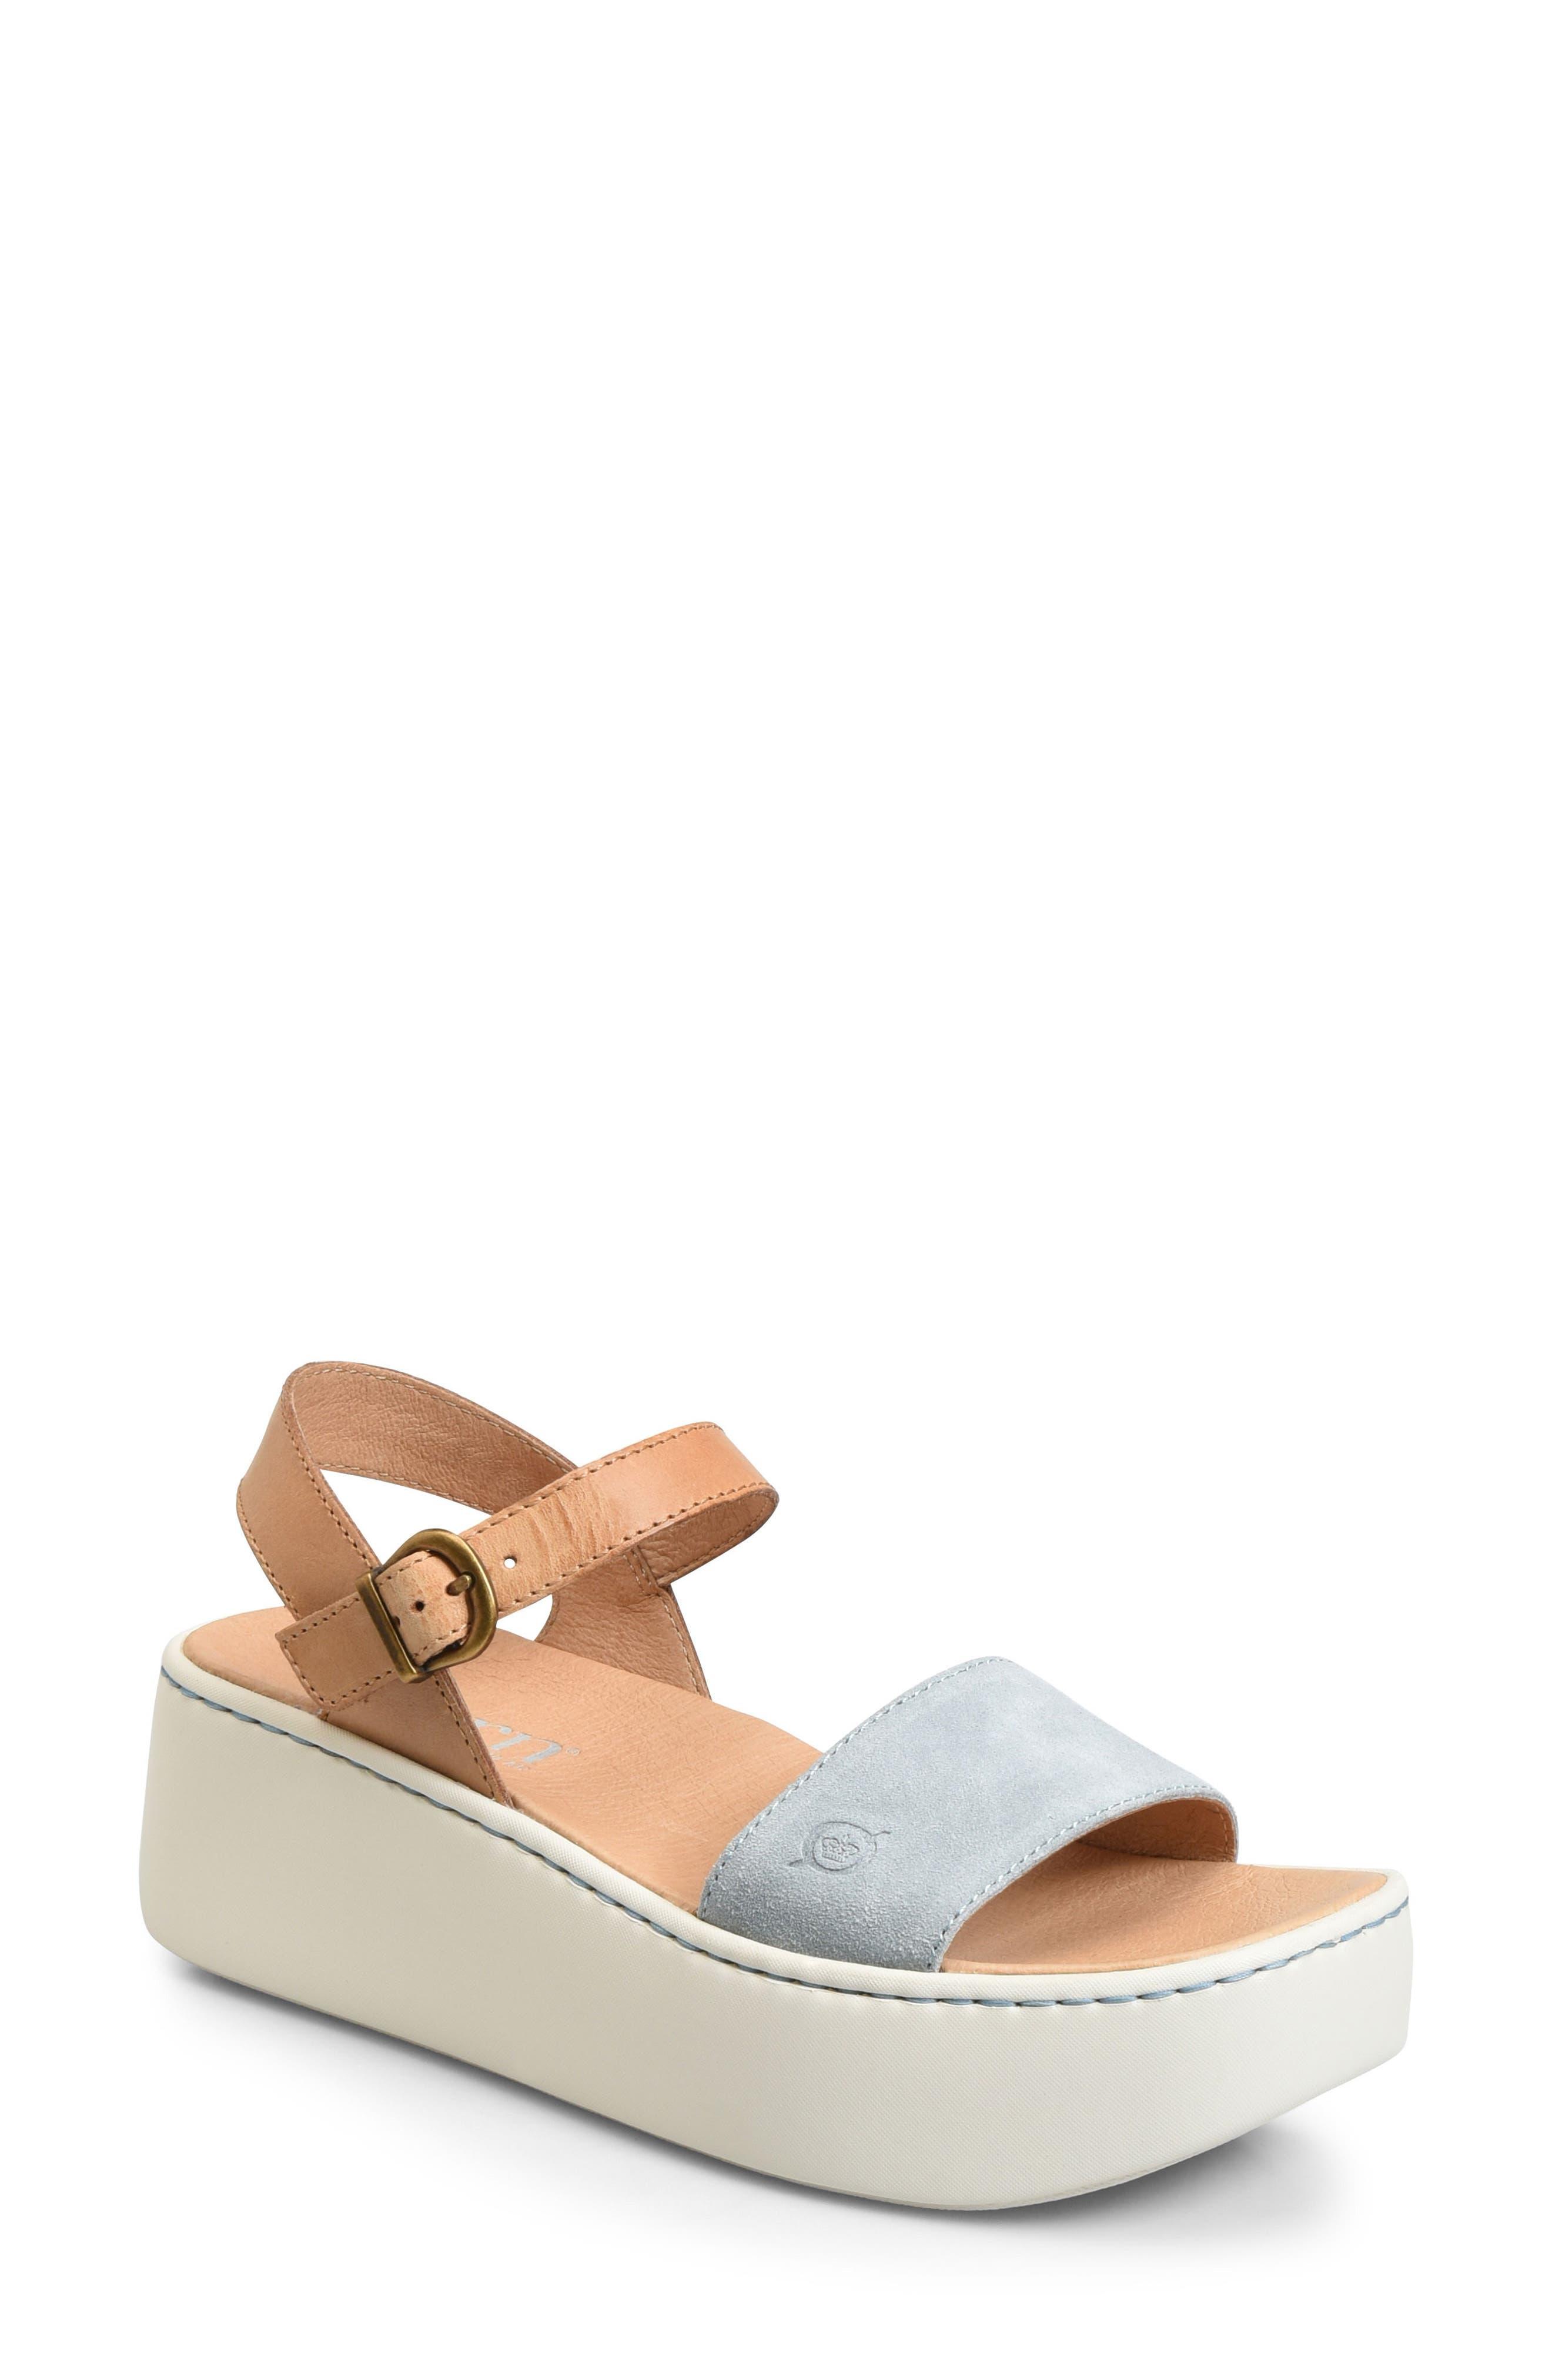 Breaker Platform Sandal,                         Main,                         color, Light Blue/ Tan Leather